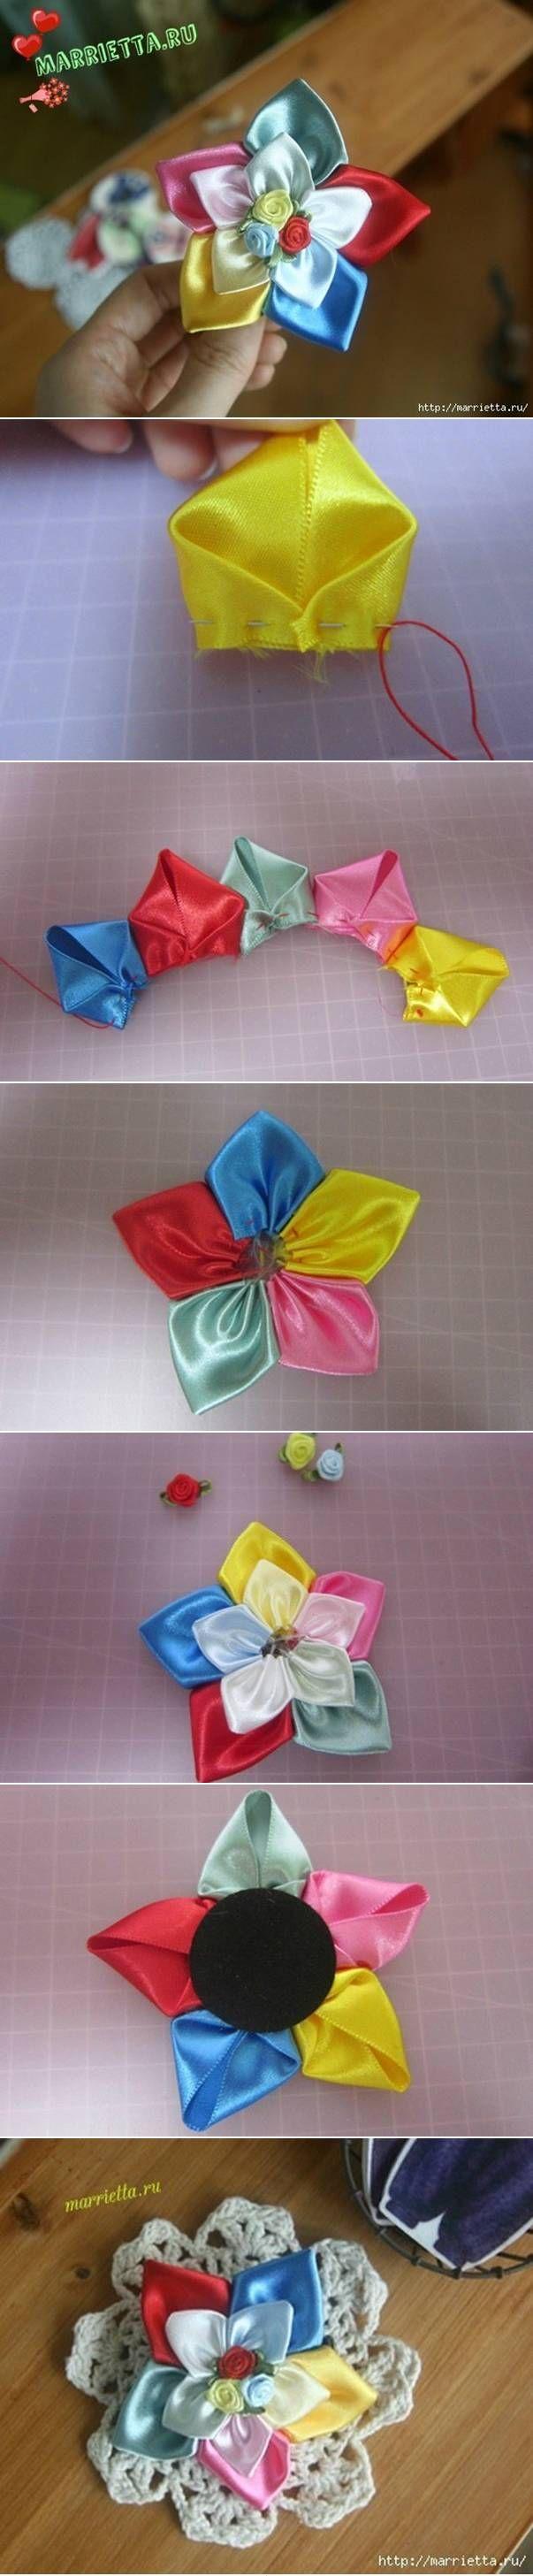 DIY Cute Modular Ribbon Flower